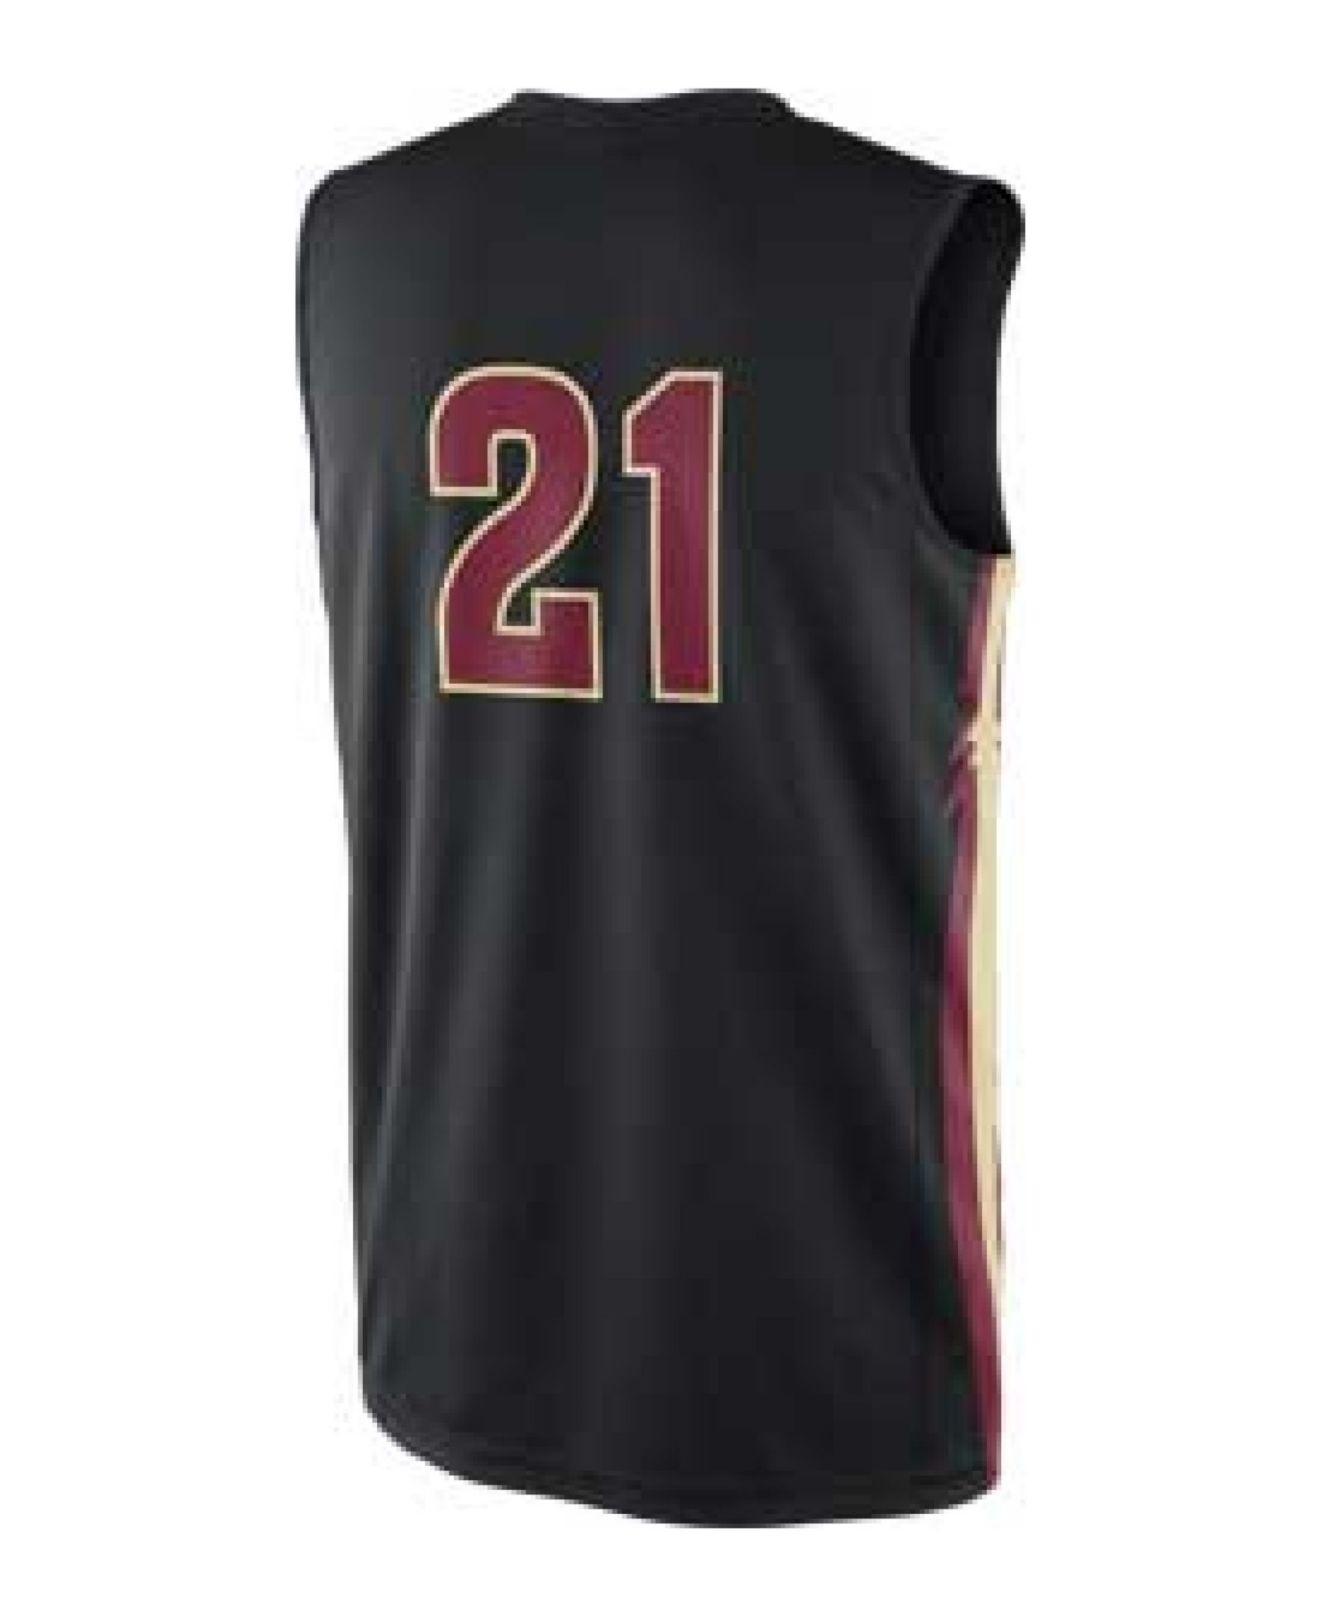 free shipping 3a0b8 7e309 Nike Black Men'S Florida State Seminoles Replica Basketball Jersey for men